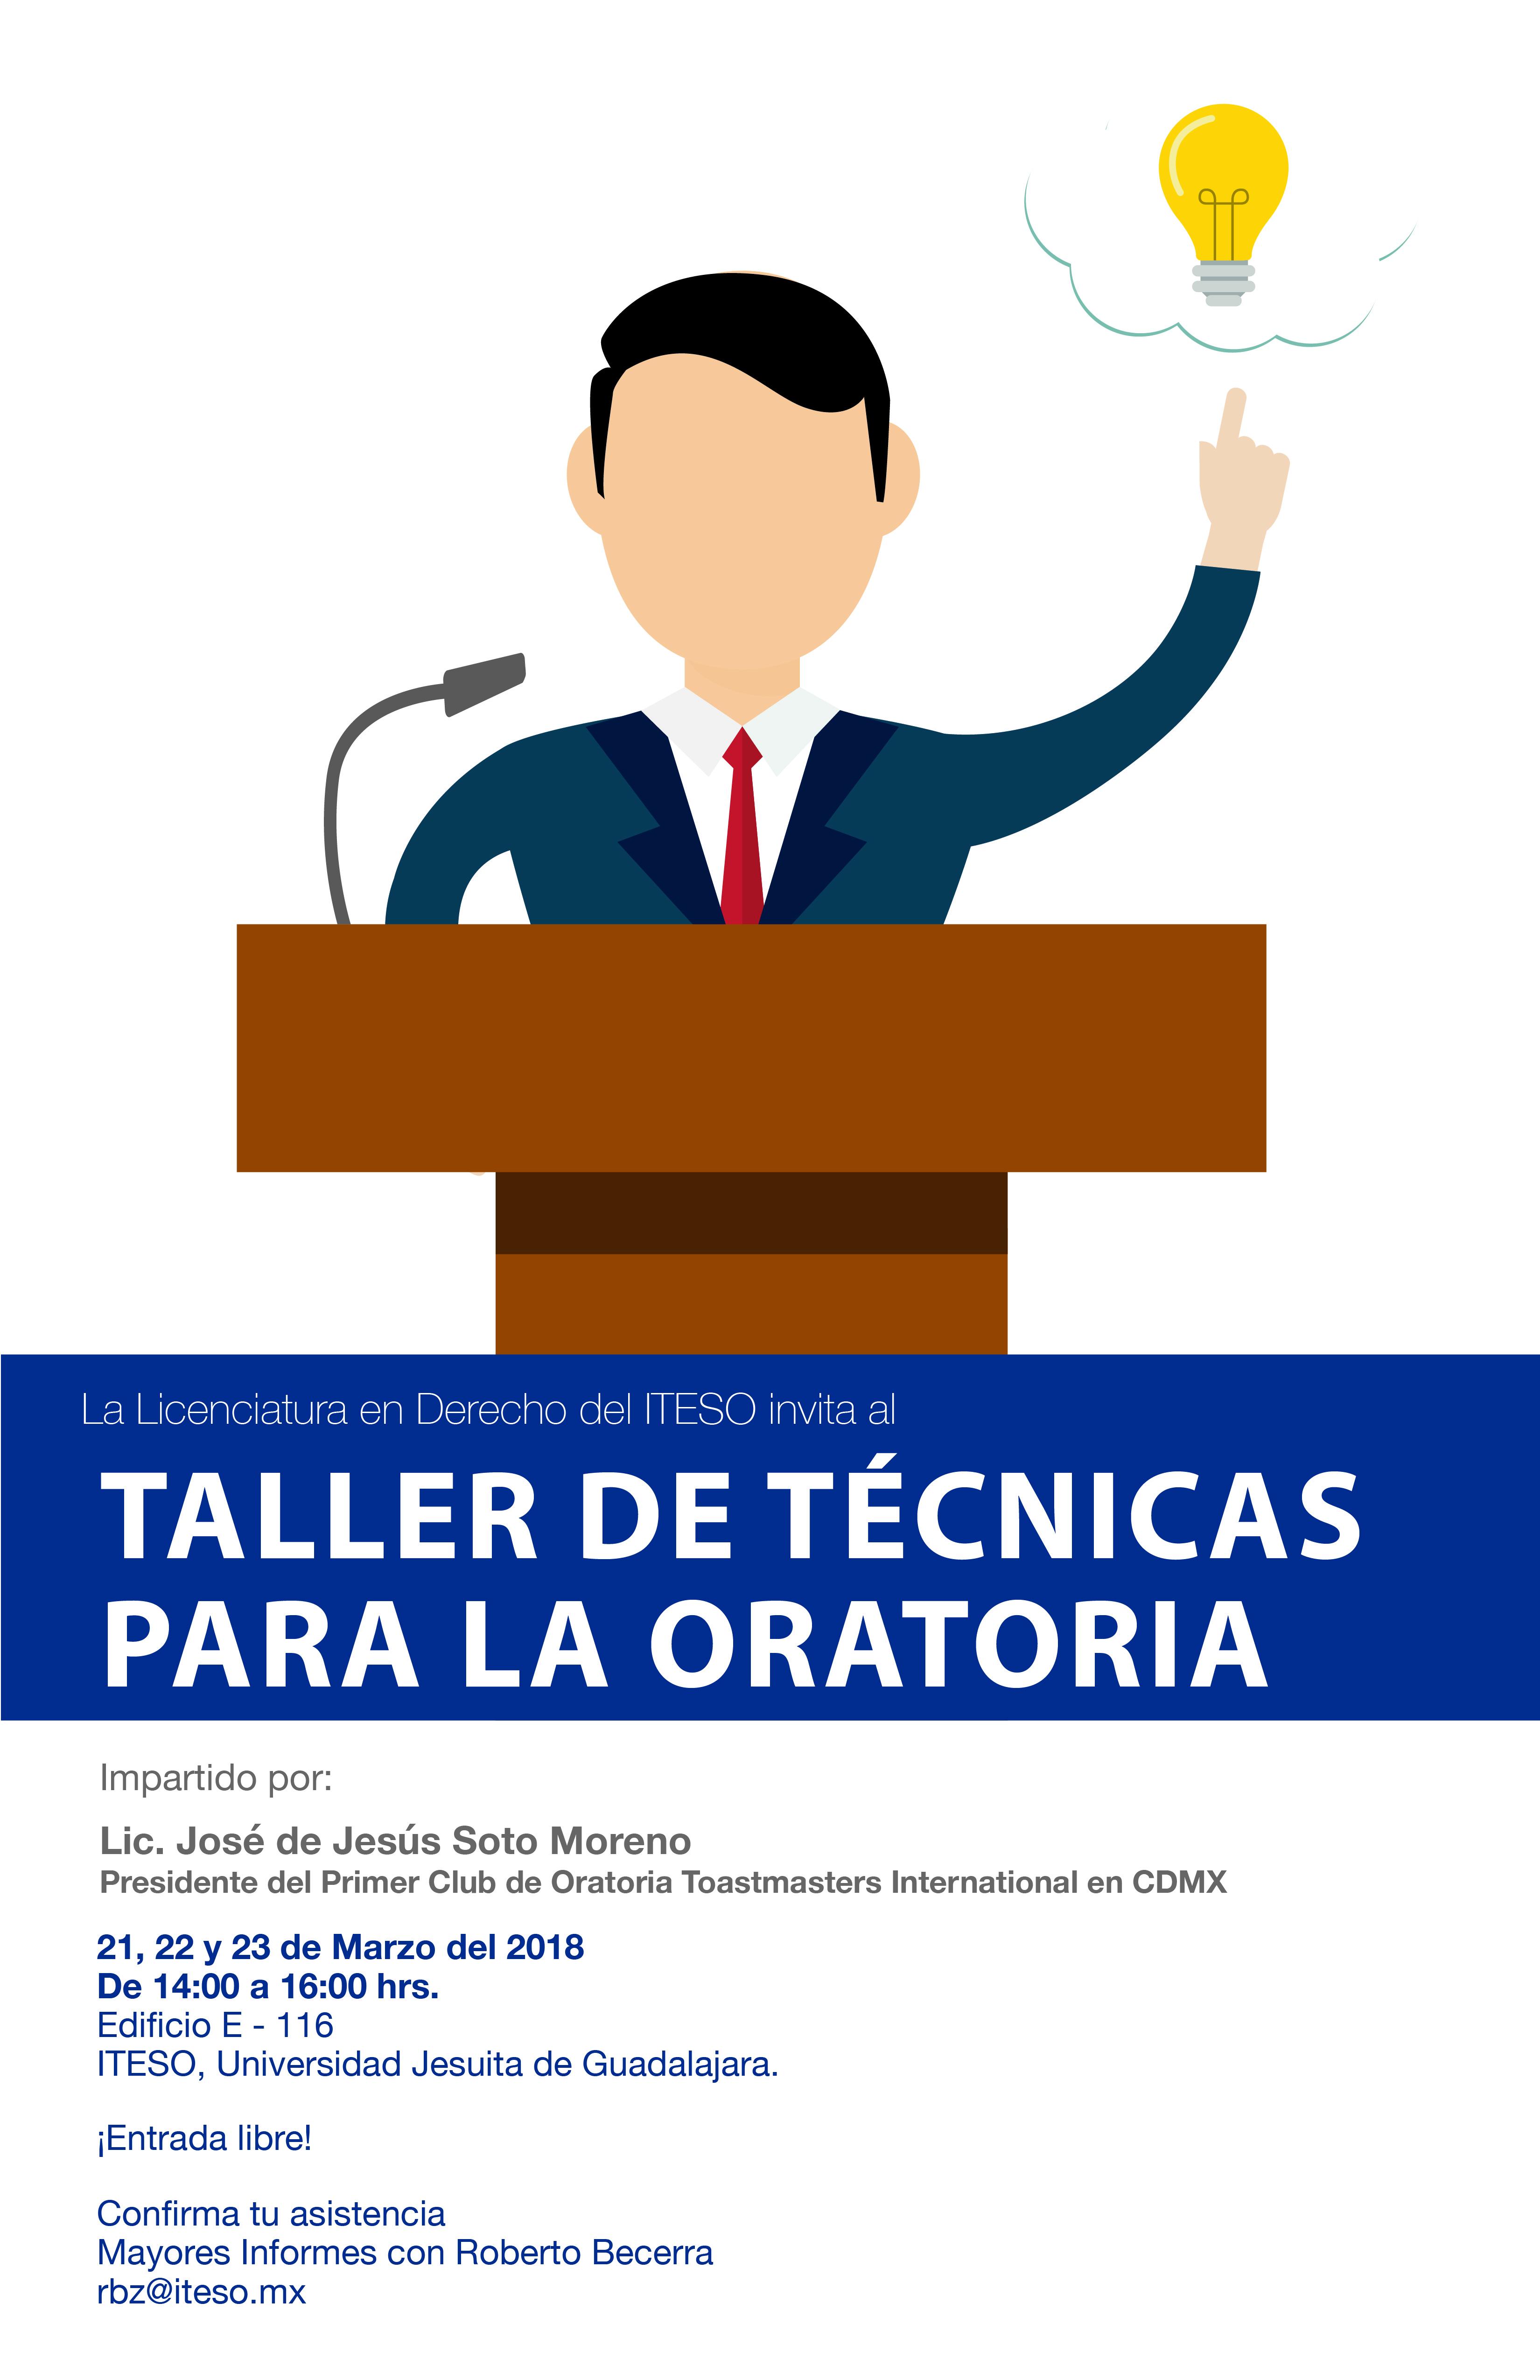 TALLER DE TÉCNICAS DE ORATORIA